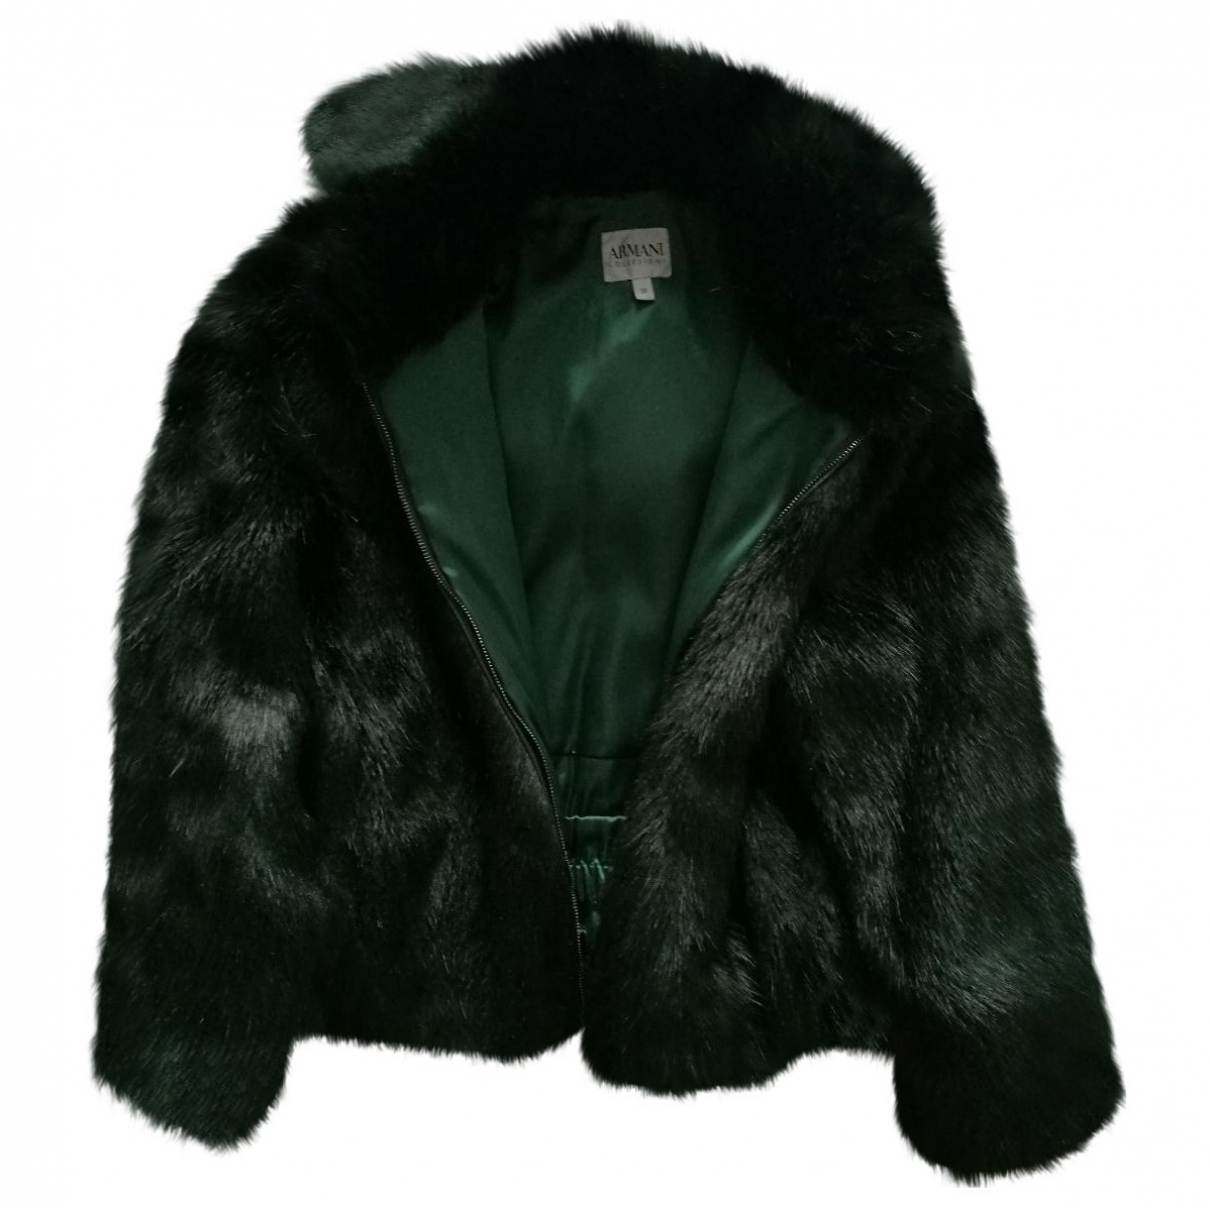 Armani Collezioni \N Green Faux fur Leather jacket for Women 38 IT